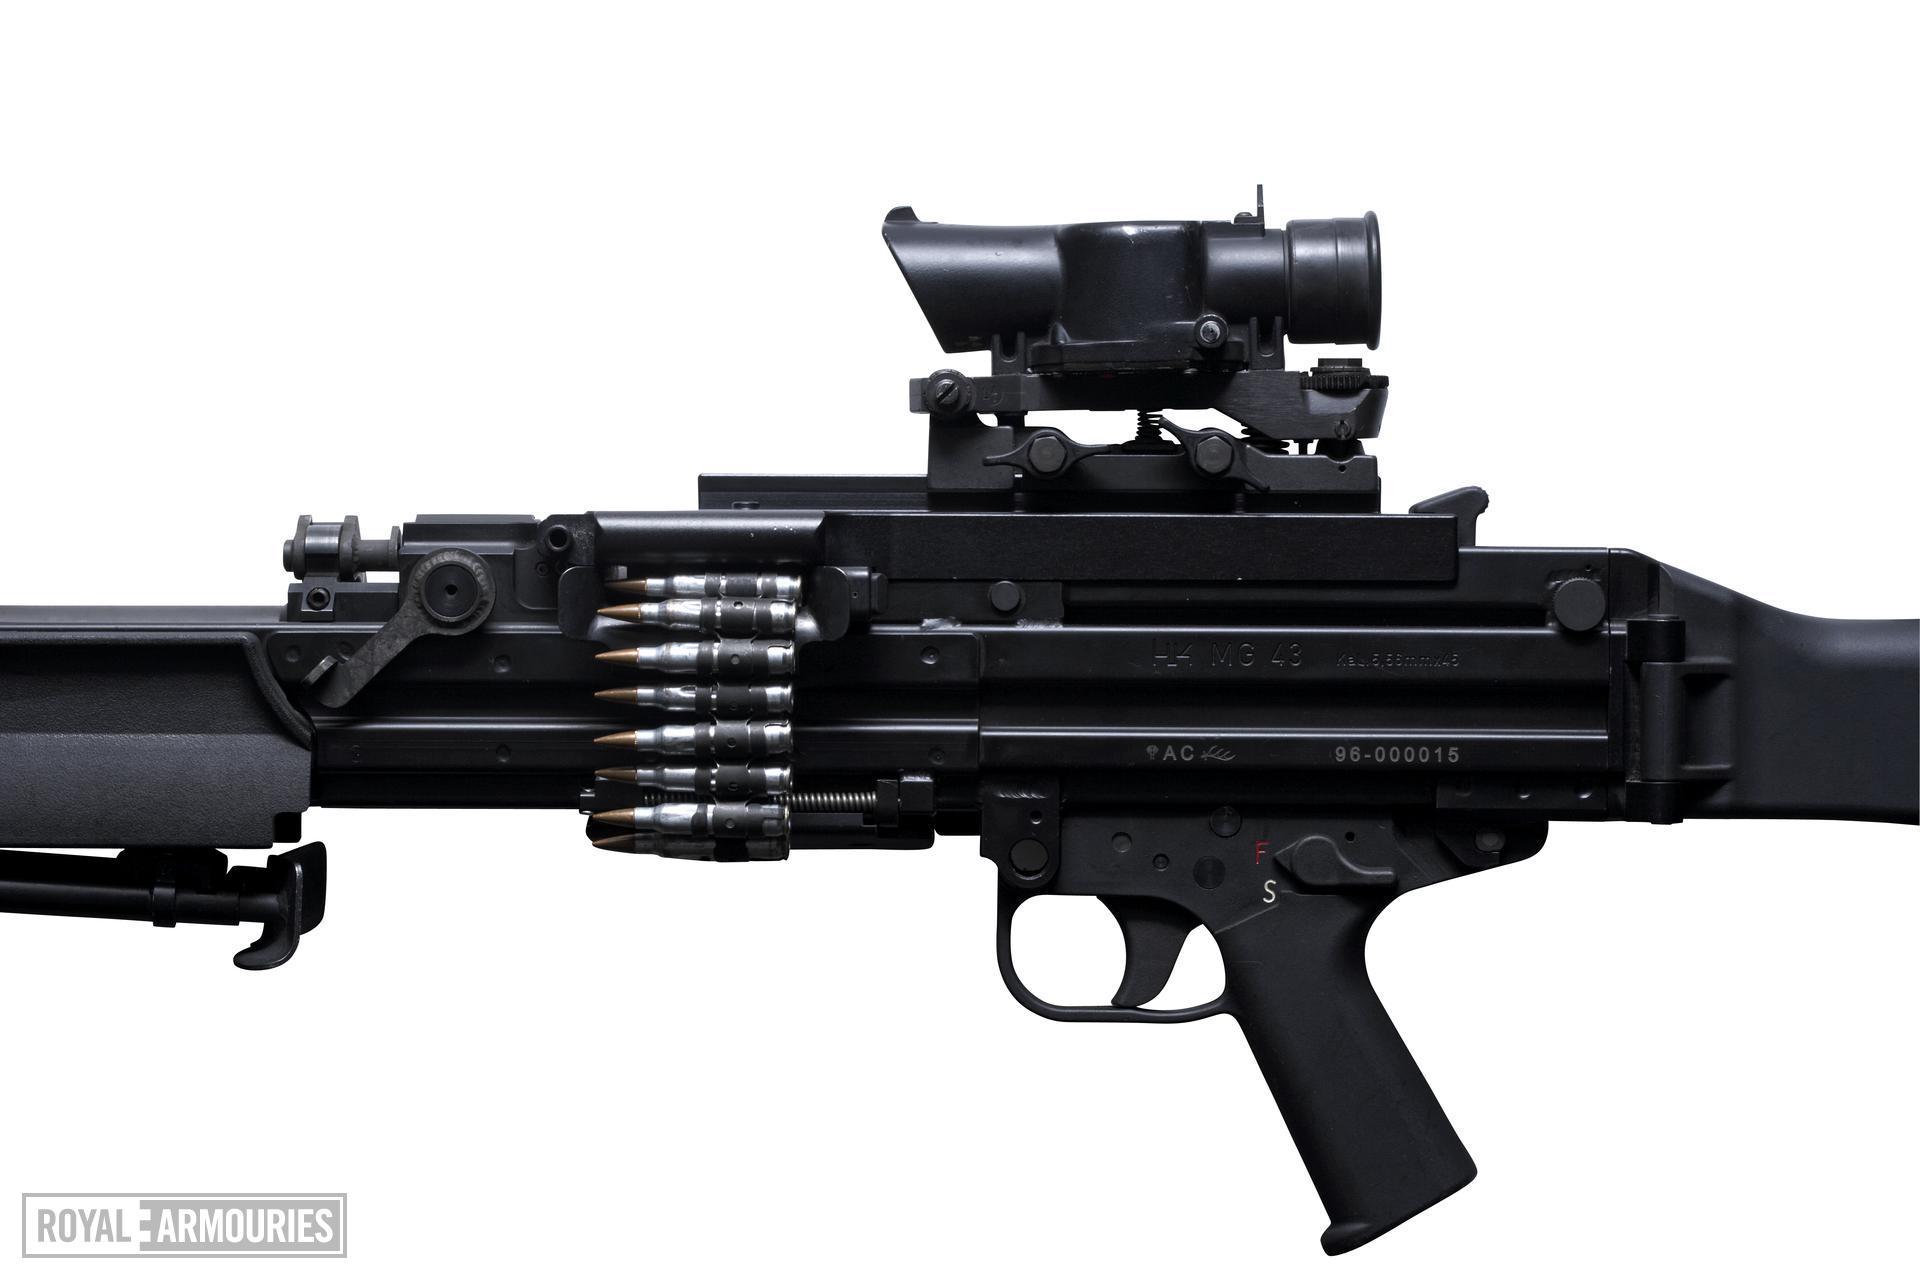 Centrefire automatic machine gun - HK MG 43